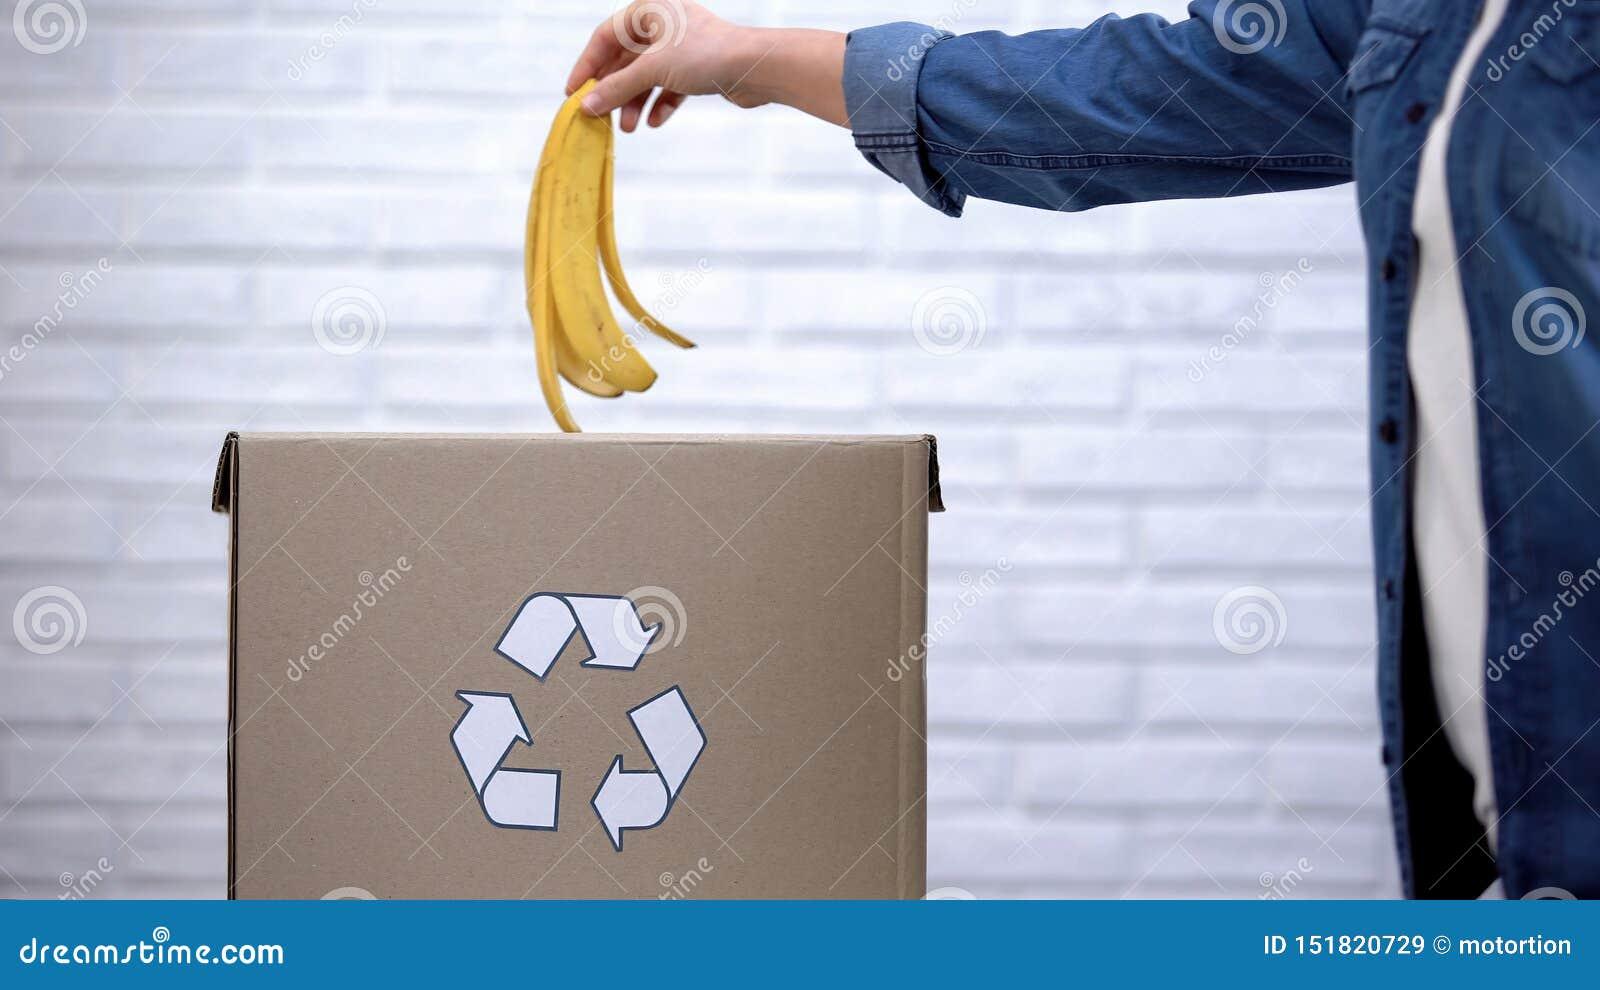 Person throwing banana peel into trash bin, organic waste sorting, awareness